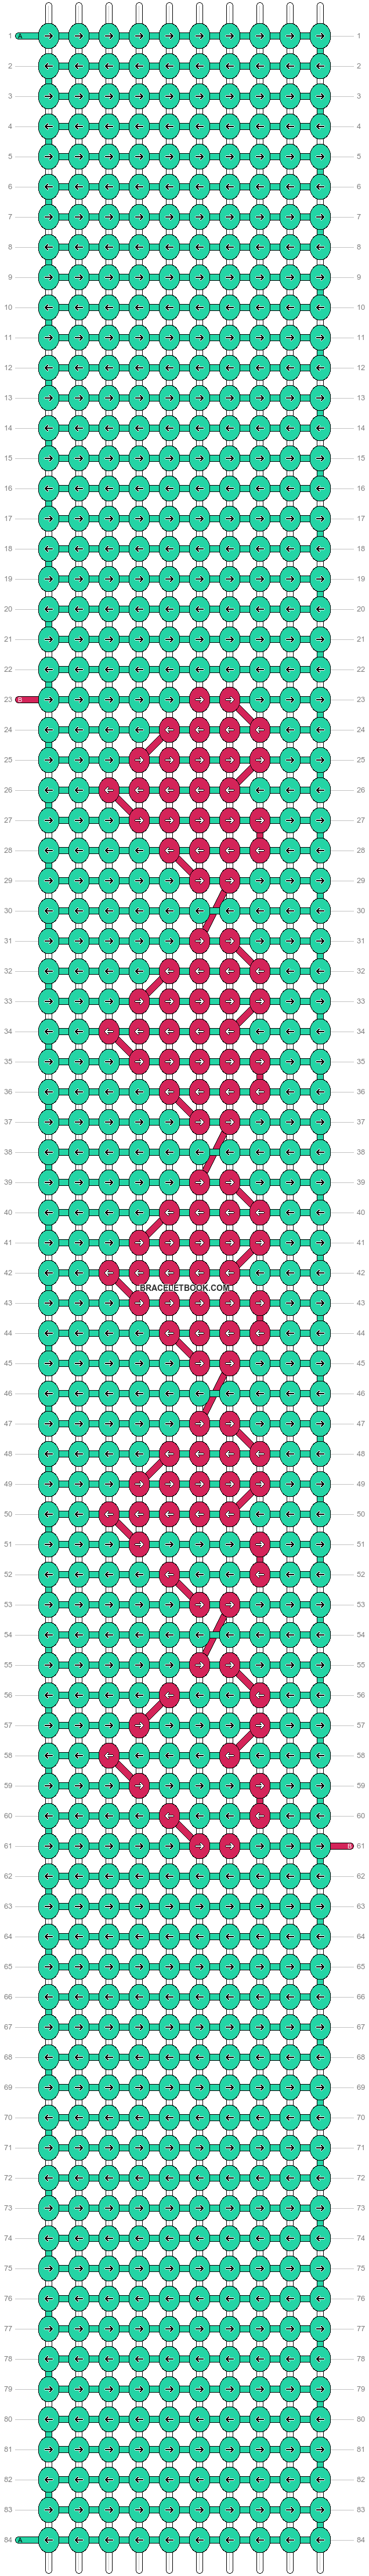 Alpha pattern #17376 pattern